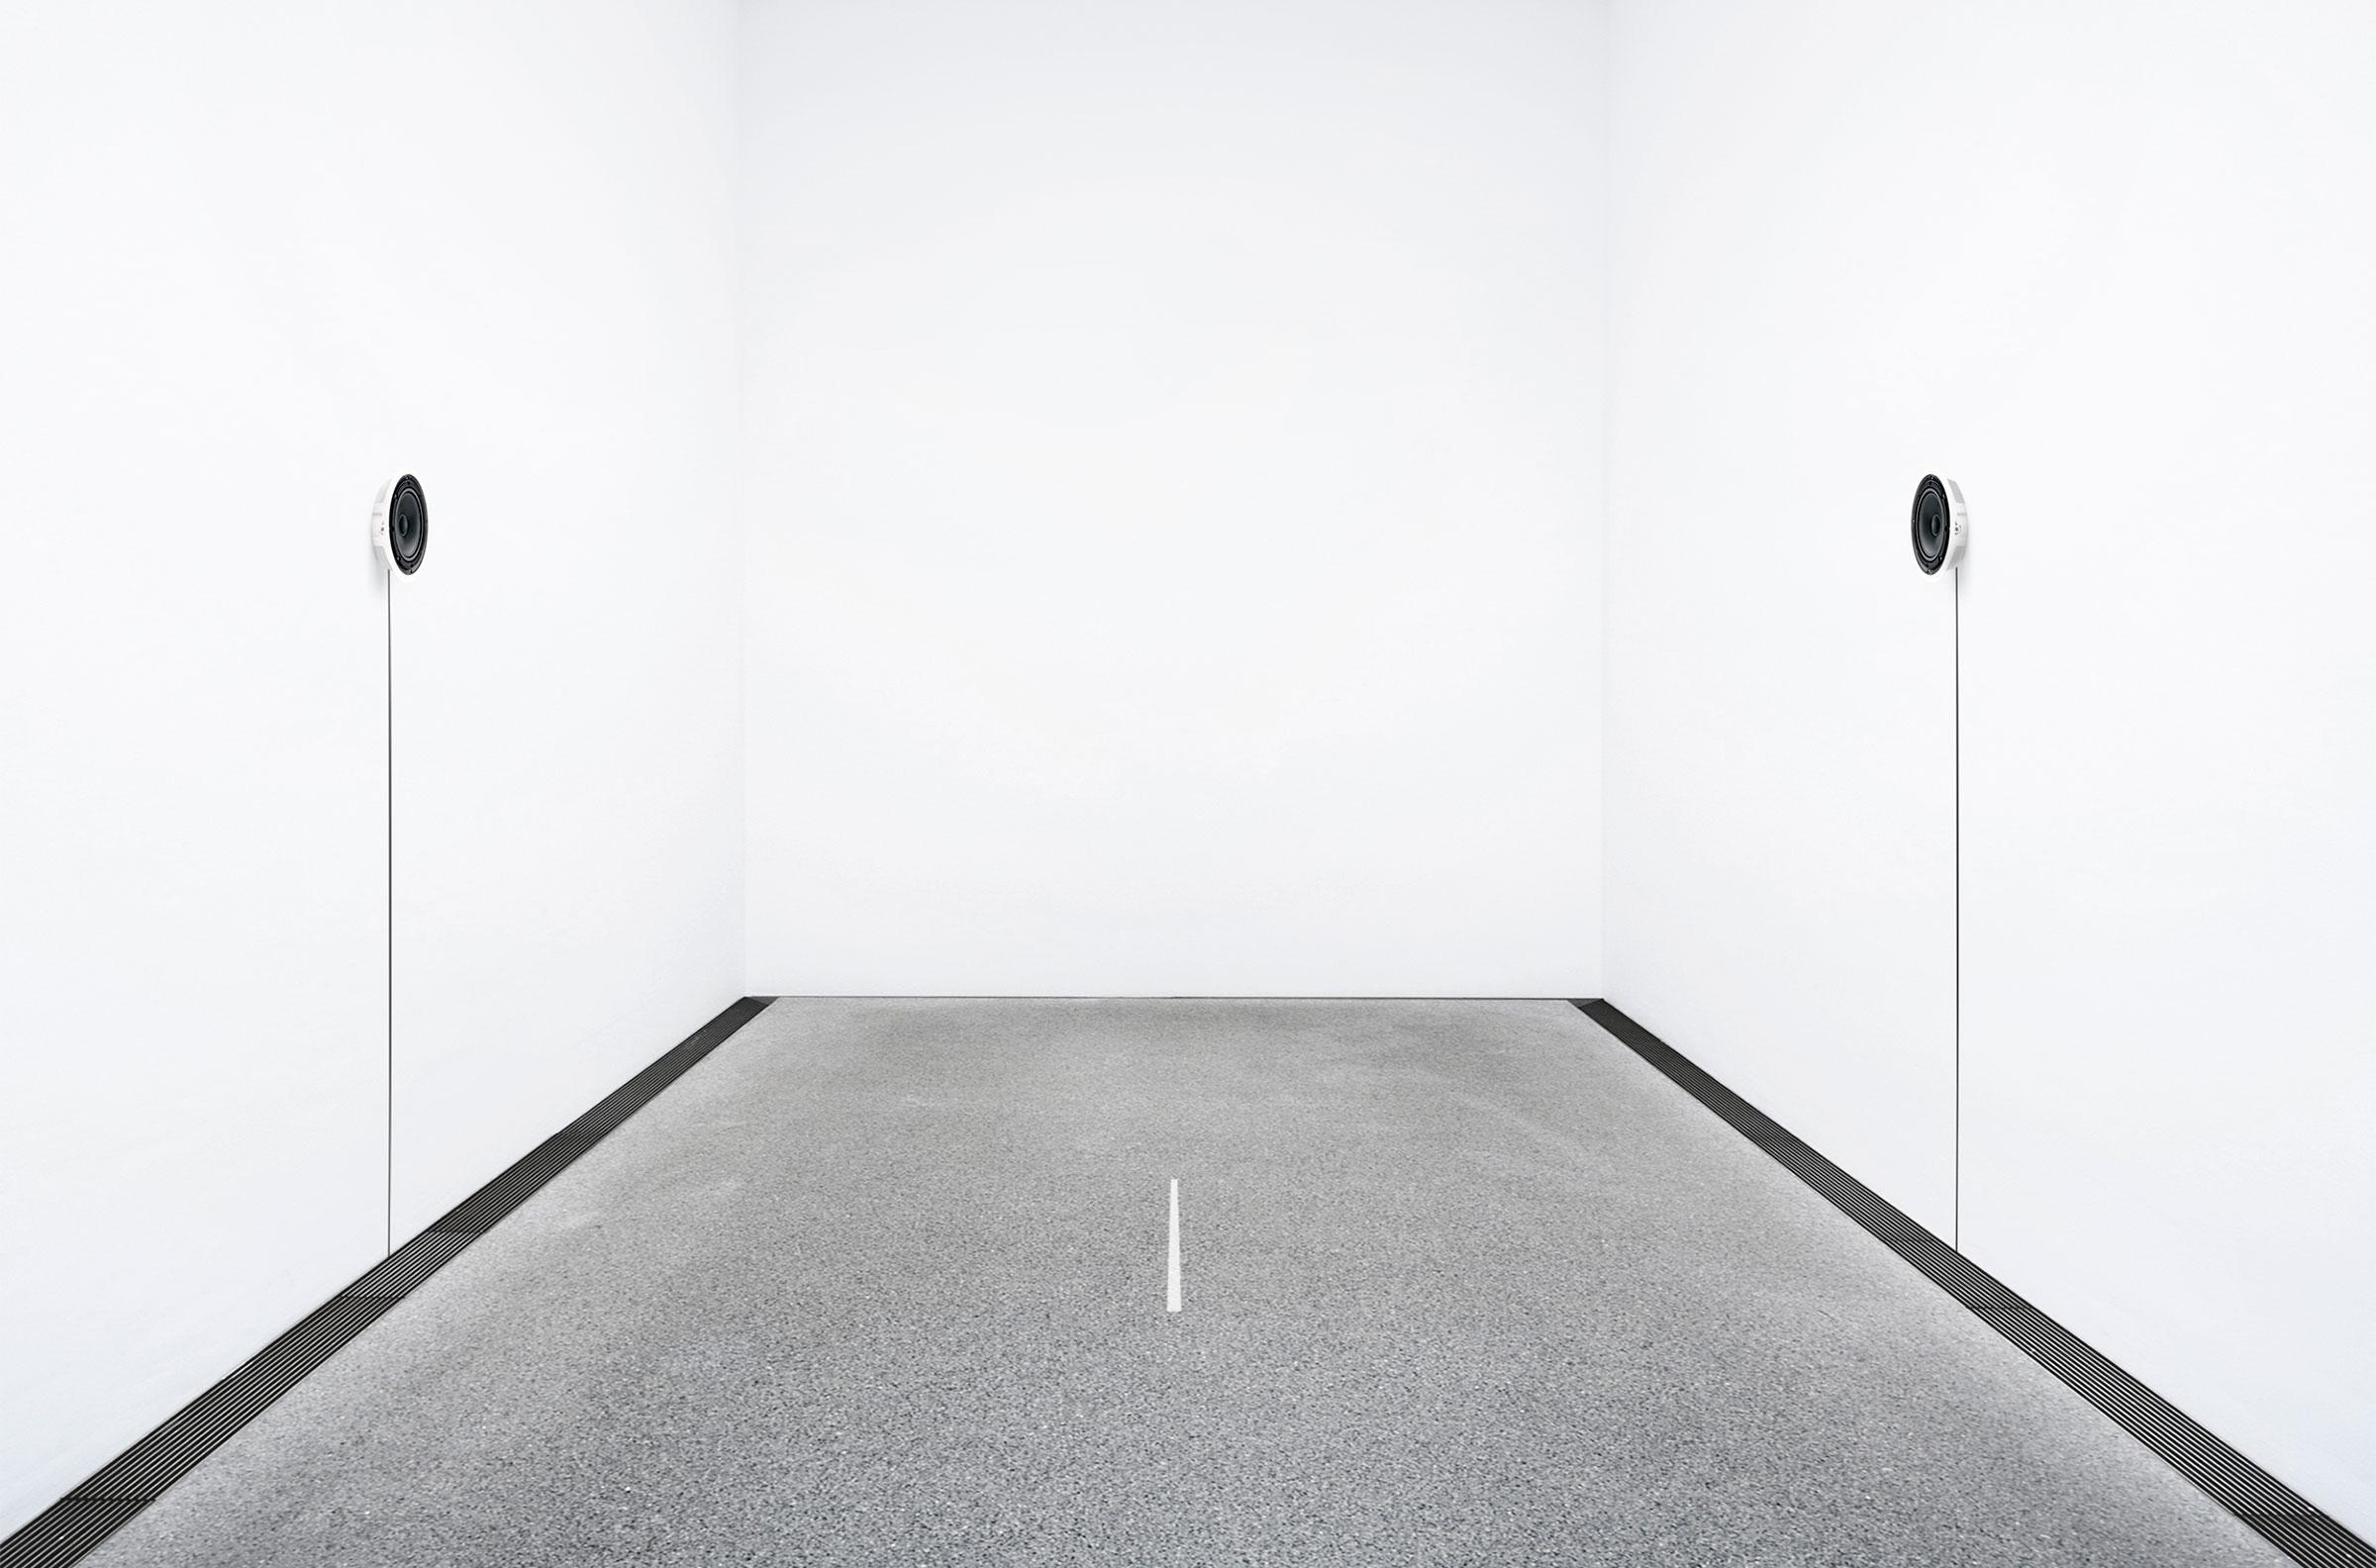 Jacek Doroszenko - Aberration maker, exhibition view 5